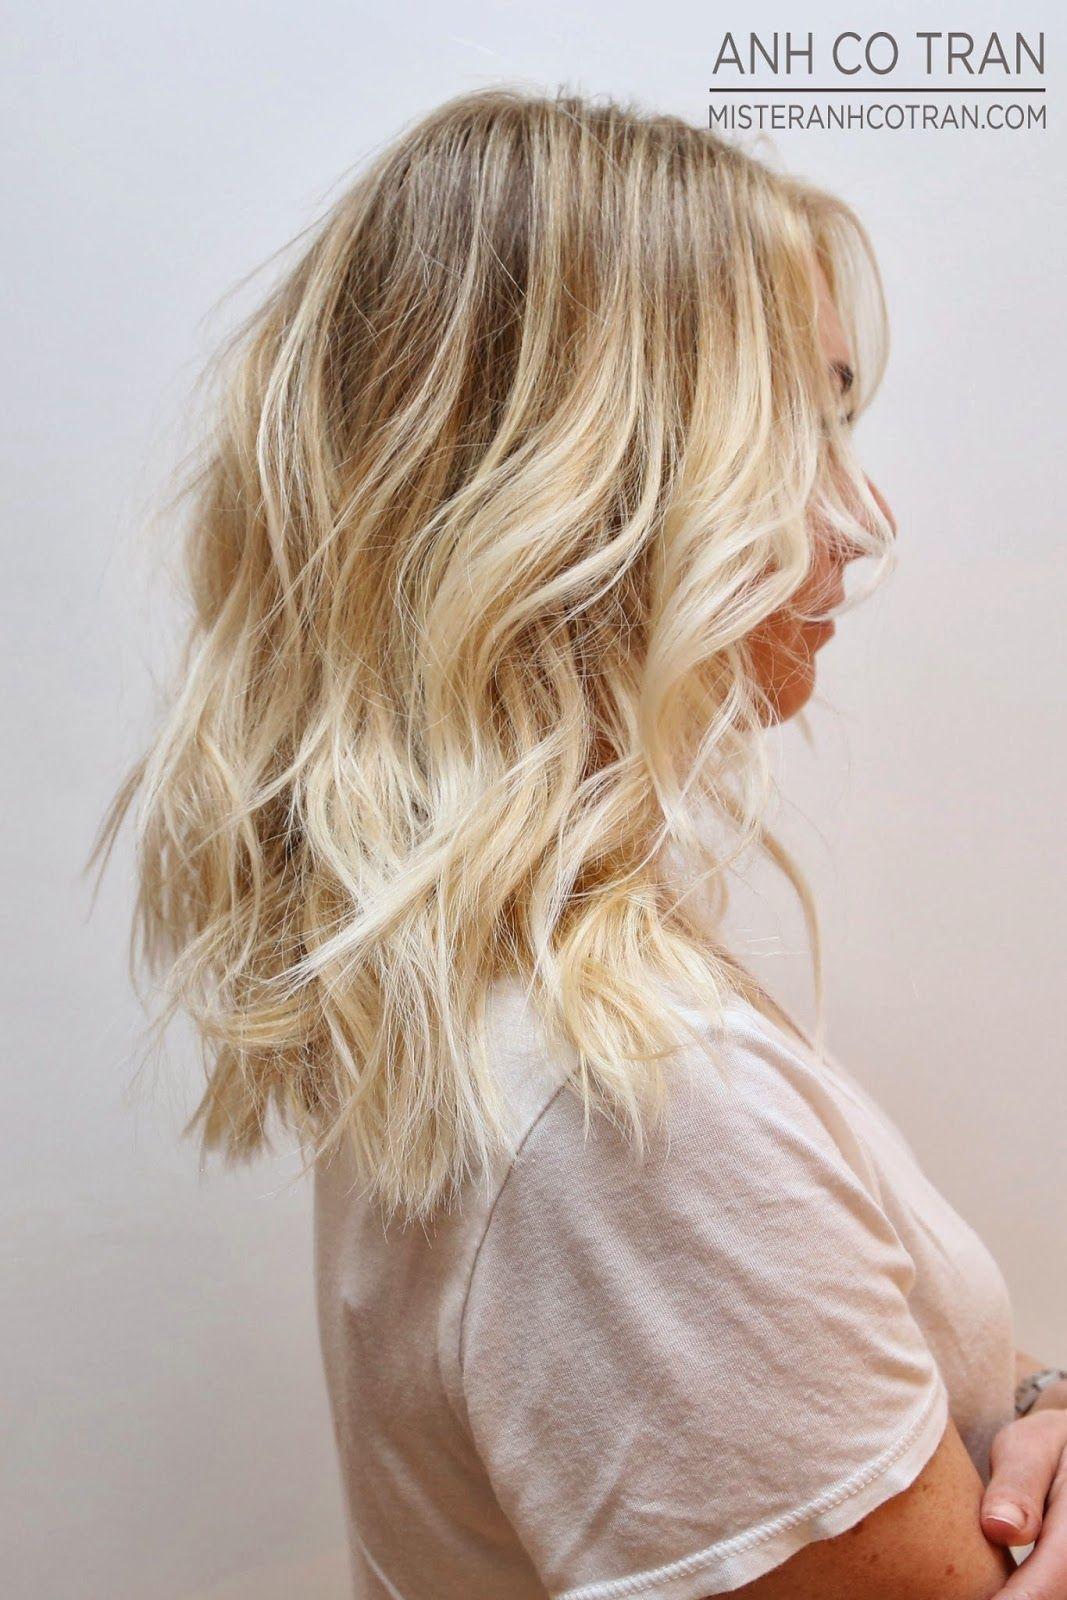 La simply gorgeous hair at ramireztran salon in beverly hills cut